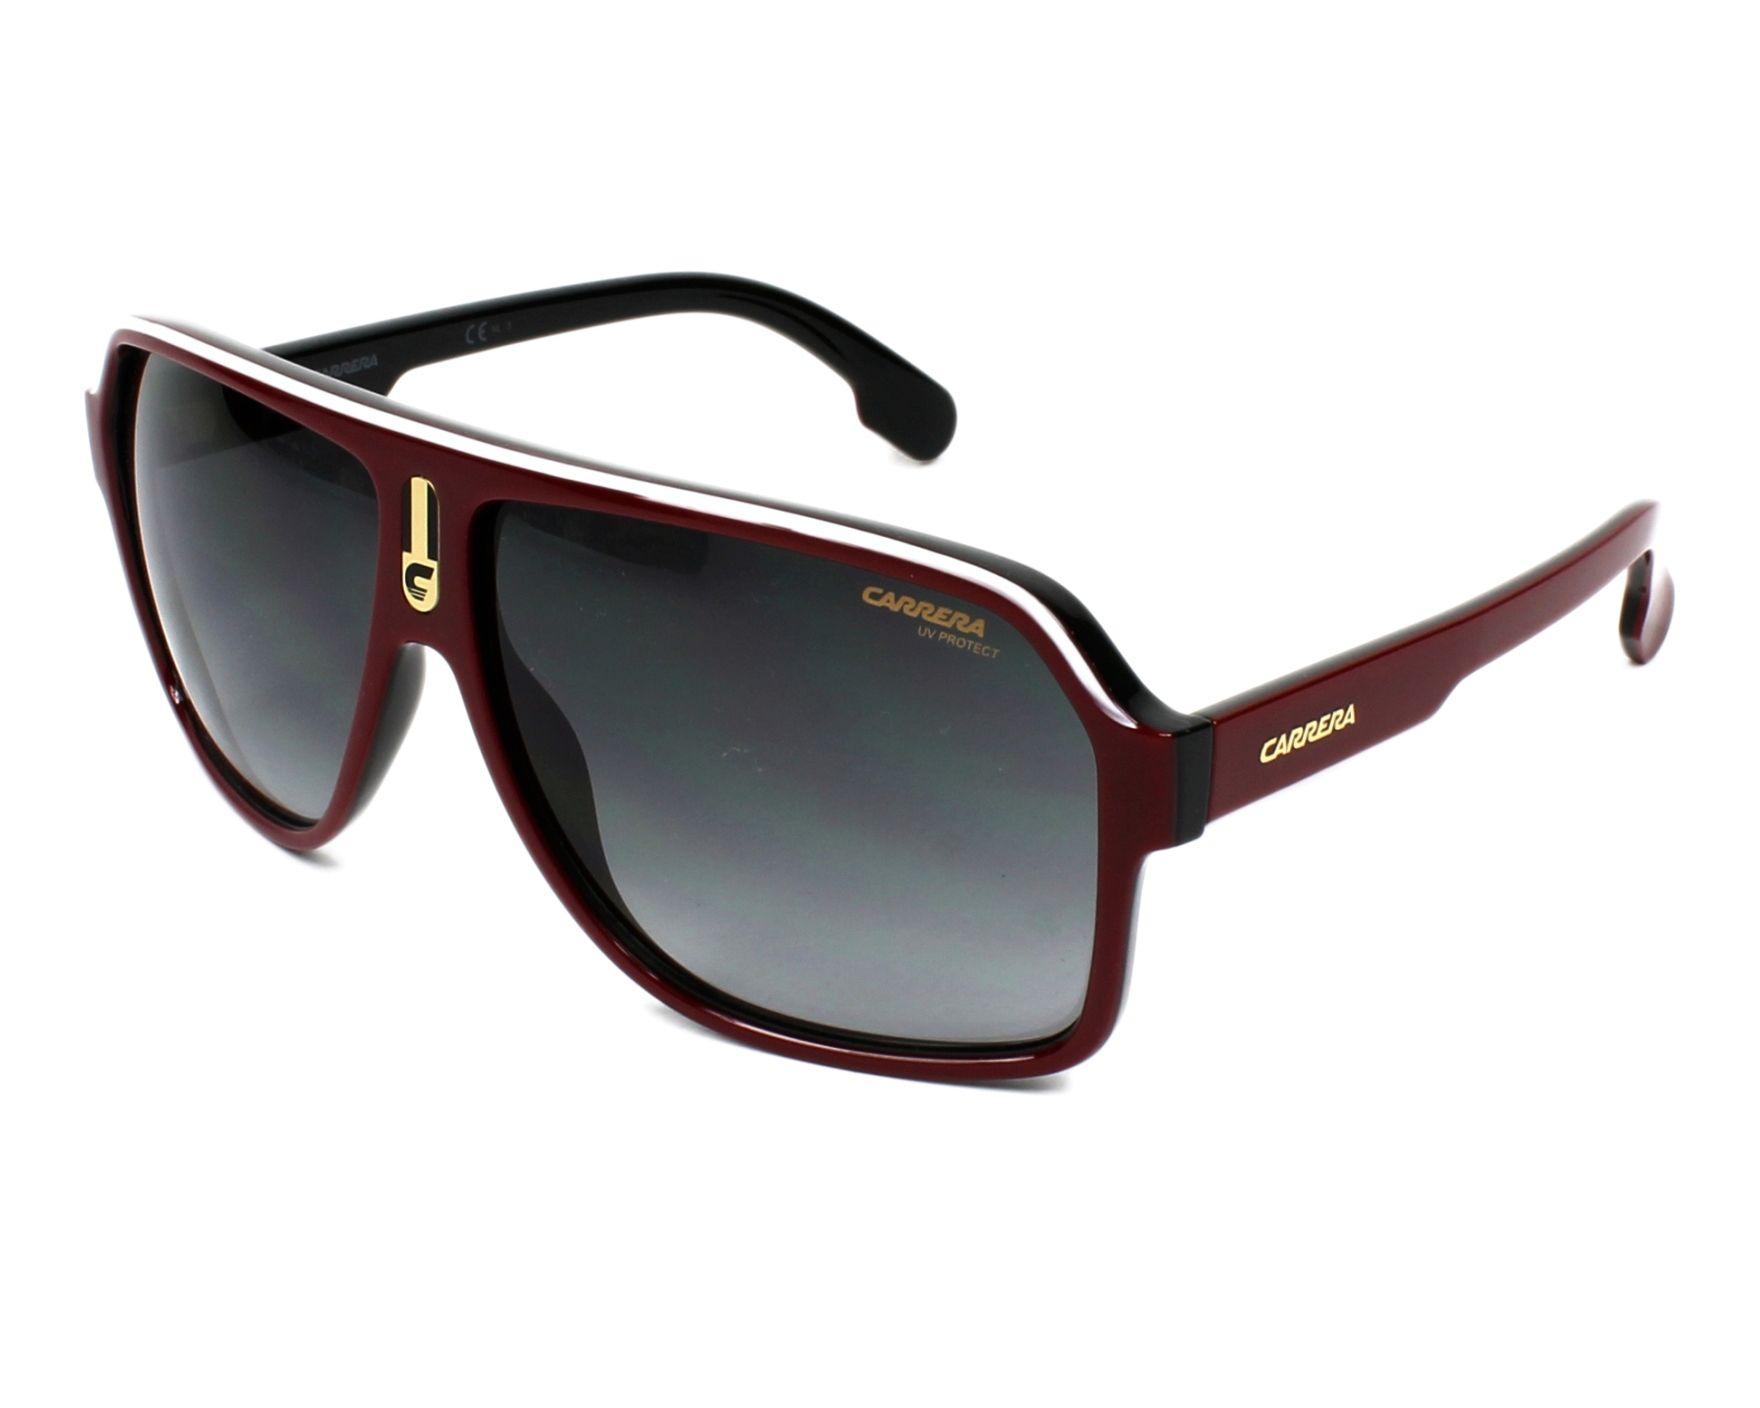 3e3a84020cc6 Sunglasses Carrera 1001-S 0A4/9O 62-11 Bordeaux profile view